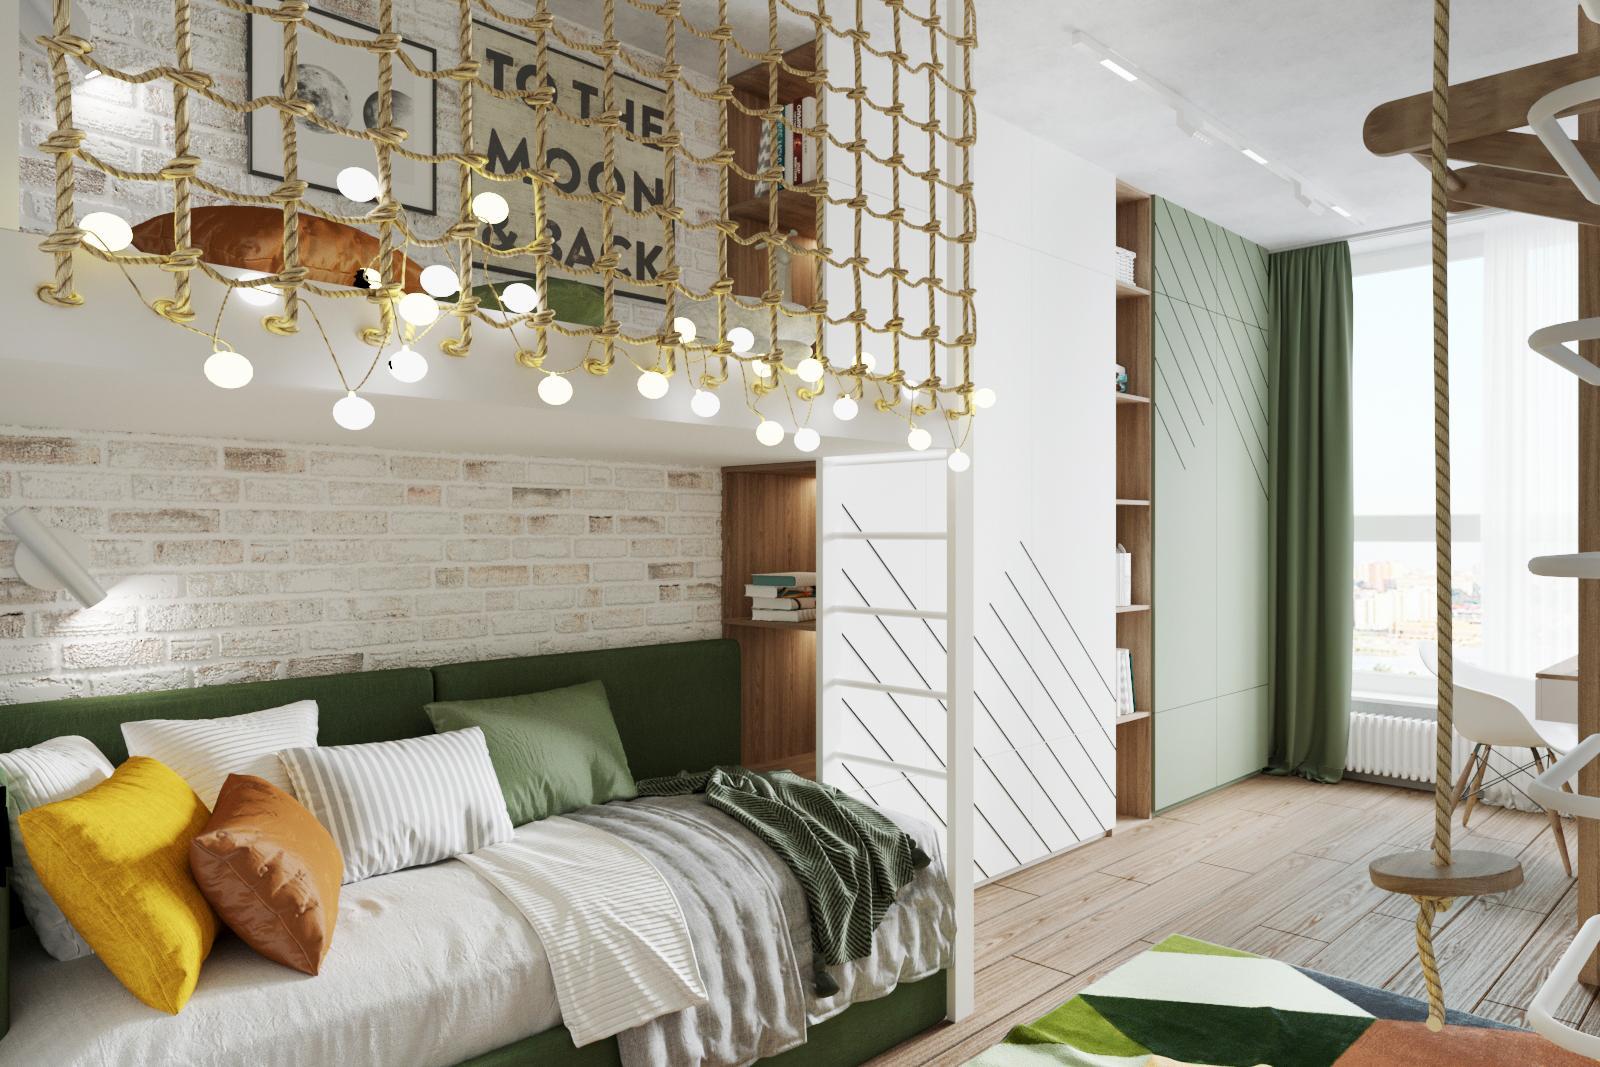 Дизайн квартиры в Панораме - 5